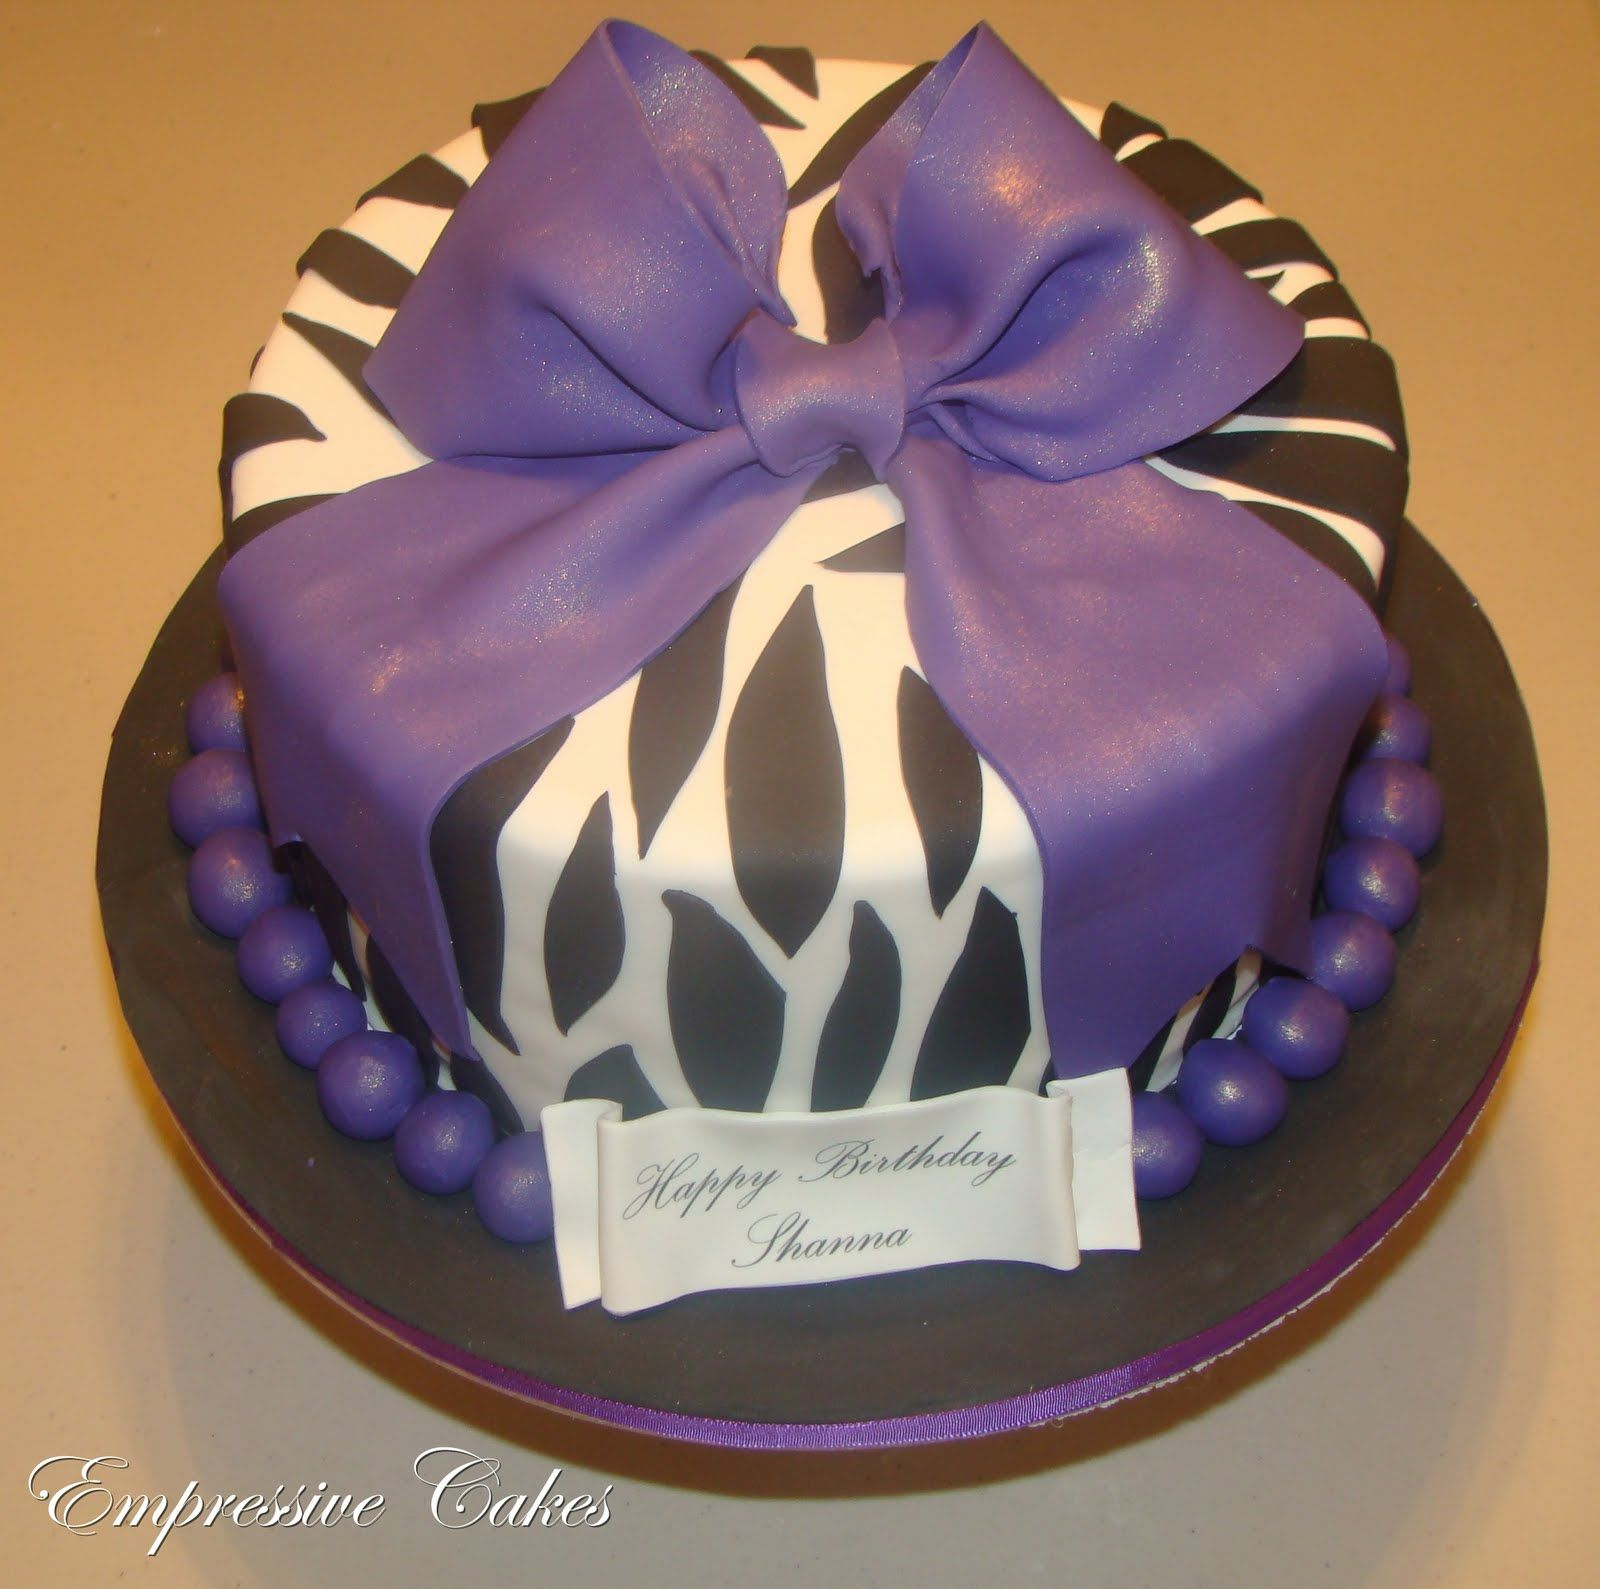 purplr cheetah cake decorations Empressive Cakes Zebra Print cake